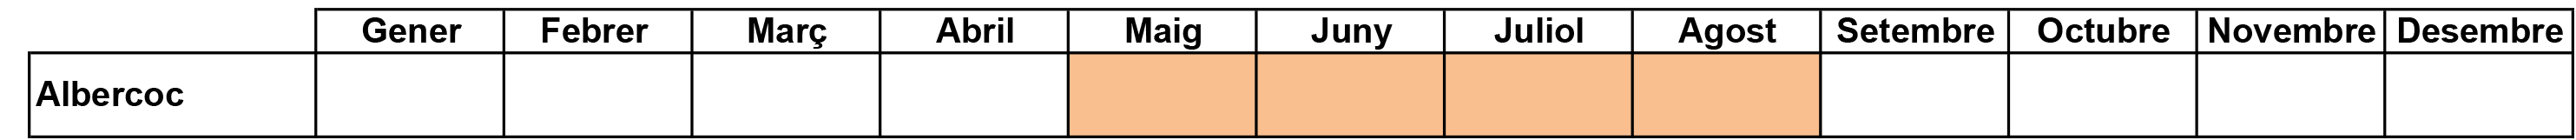 01- Calendari Albercoc